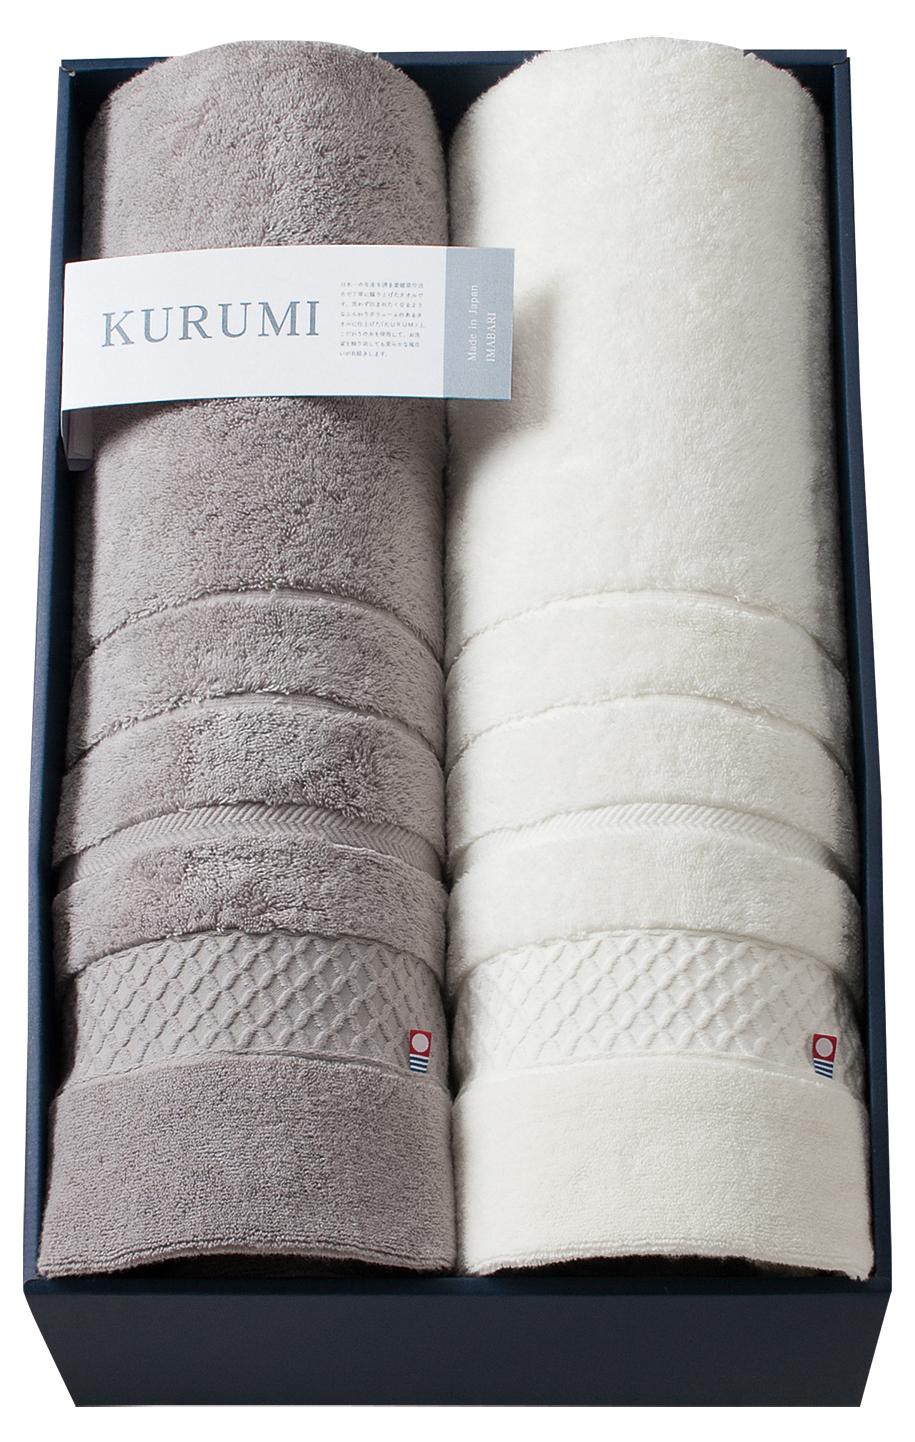 KURUMI 今治製パイル綿毛布2P(グレー・ホワイト)